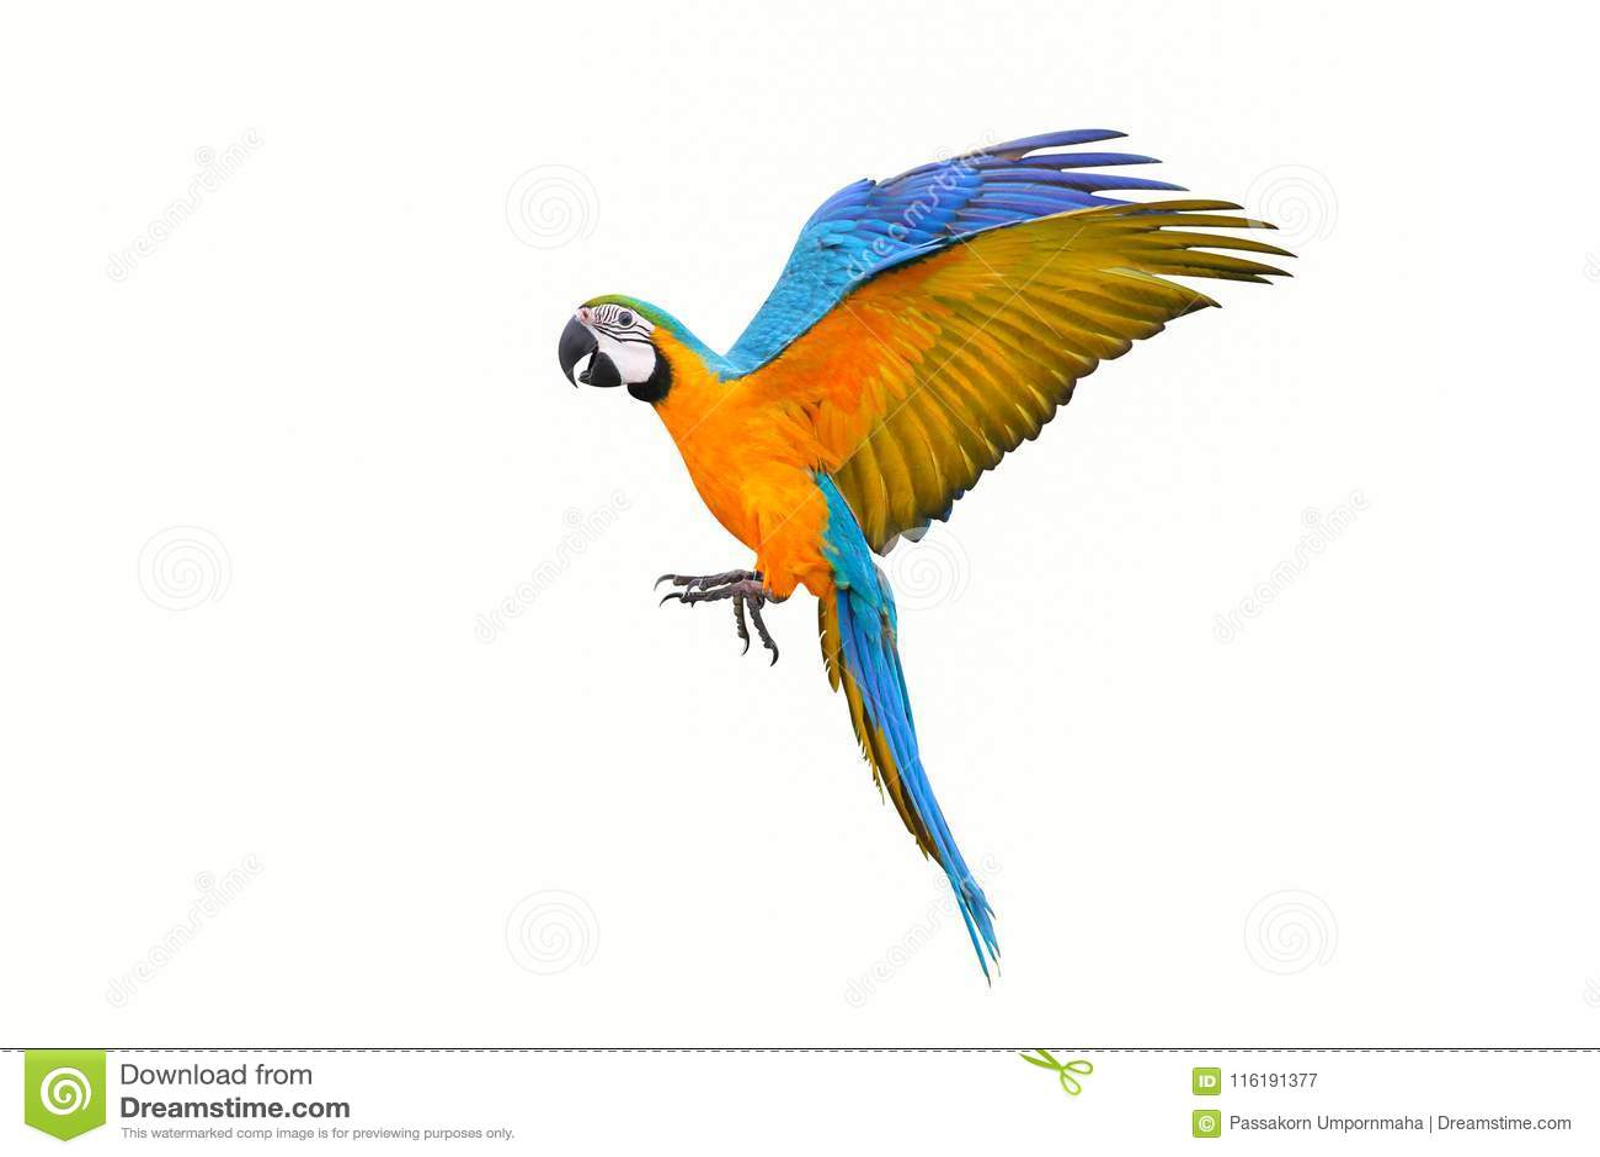 Papagaio colorido do voo isolado no branco